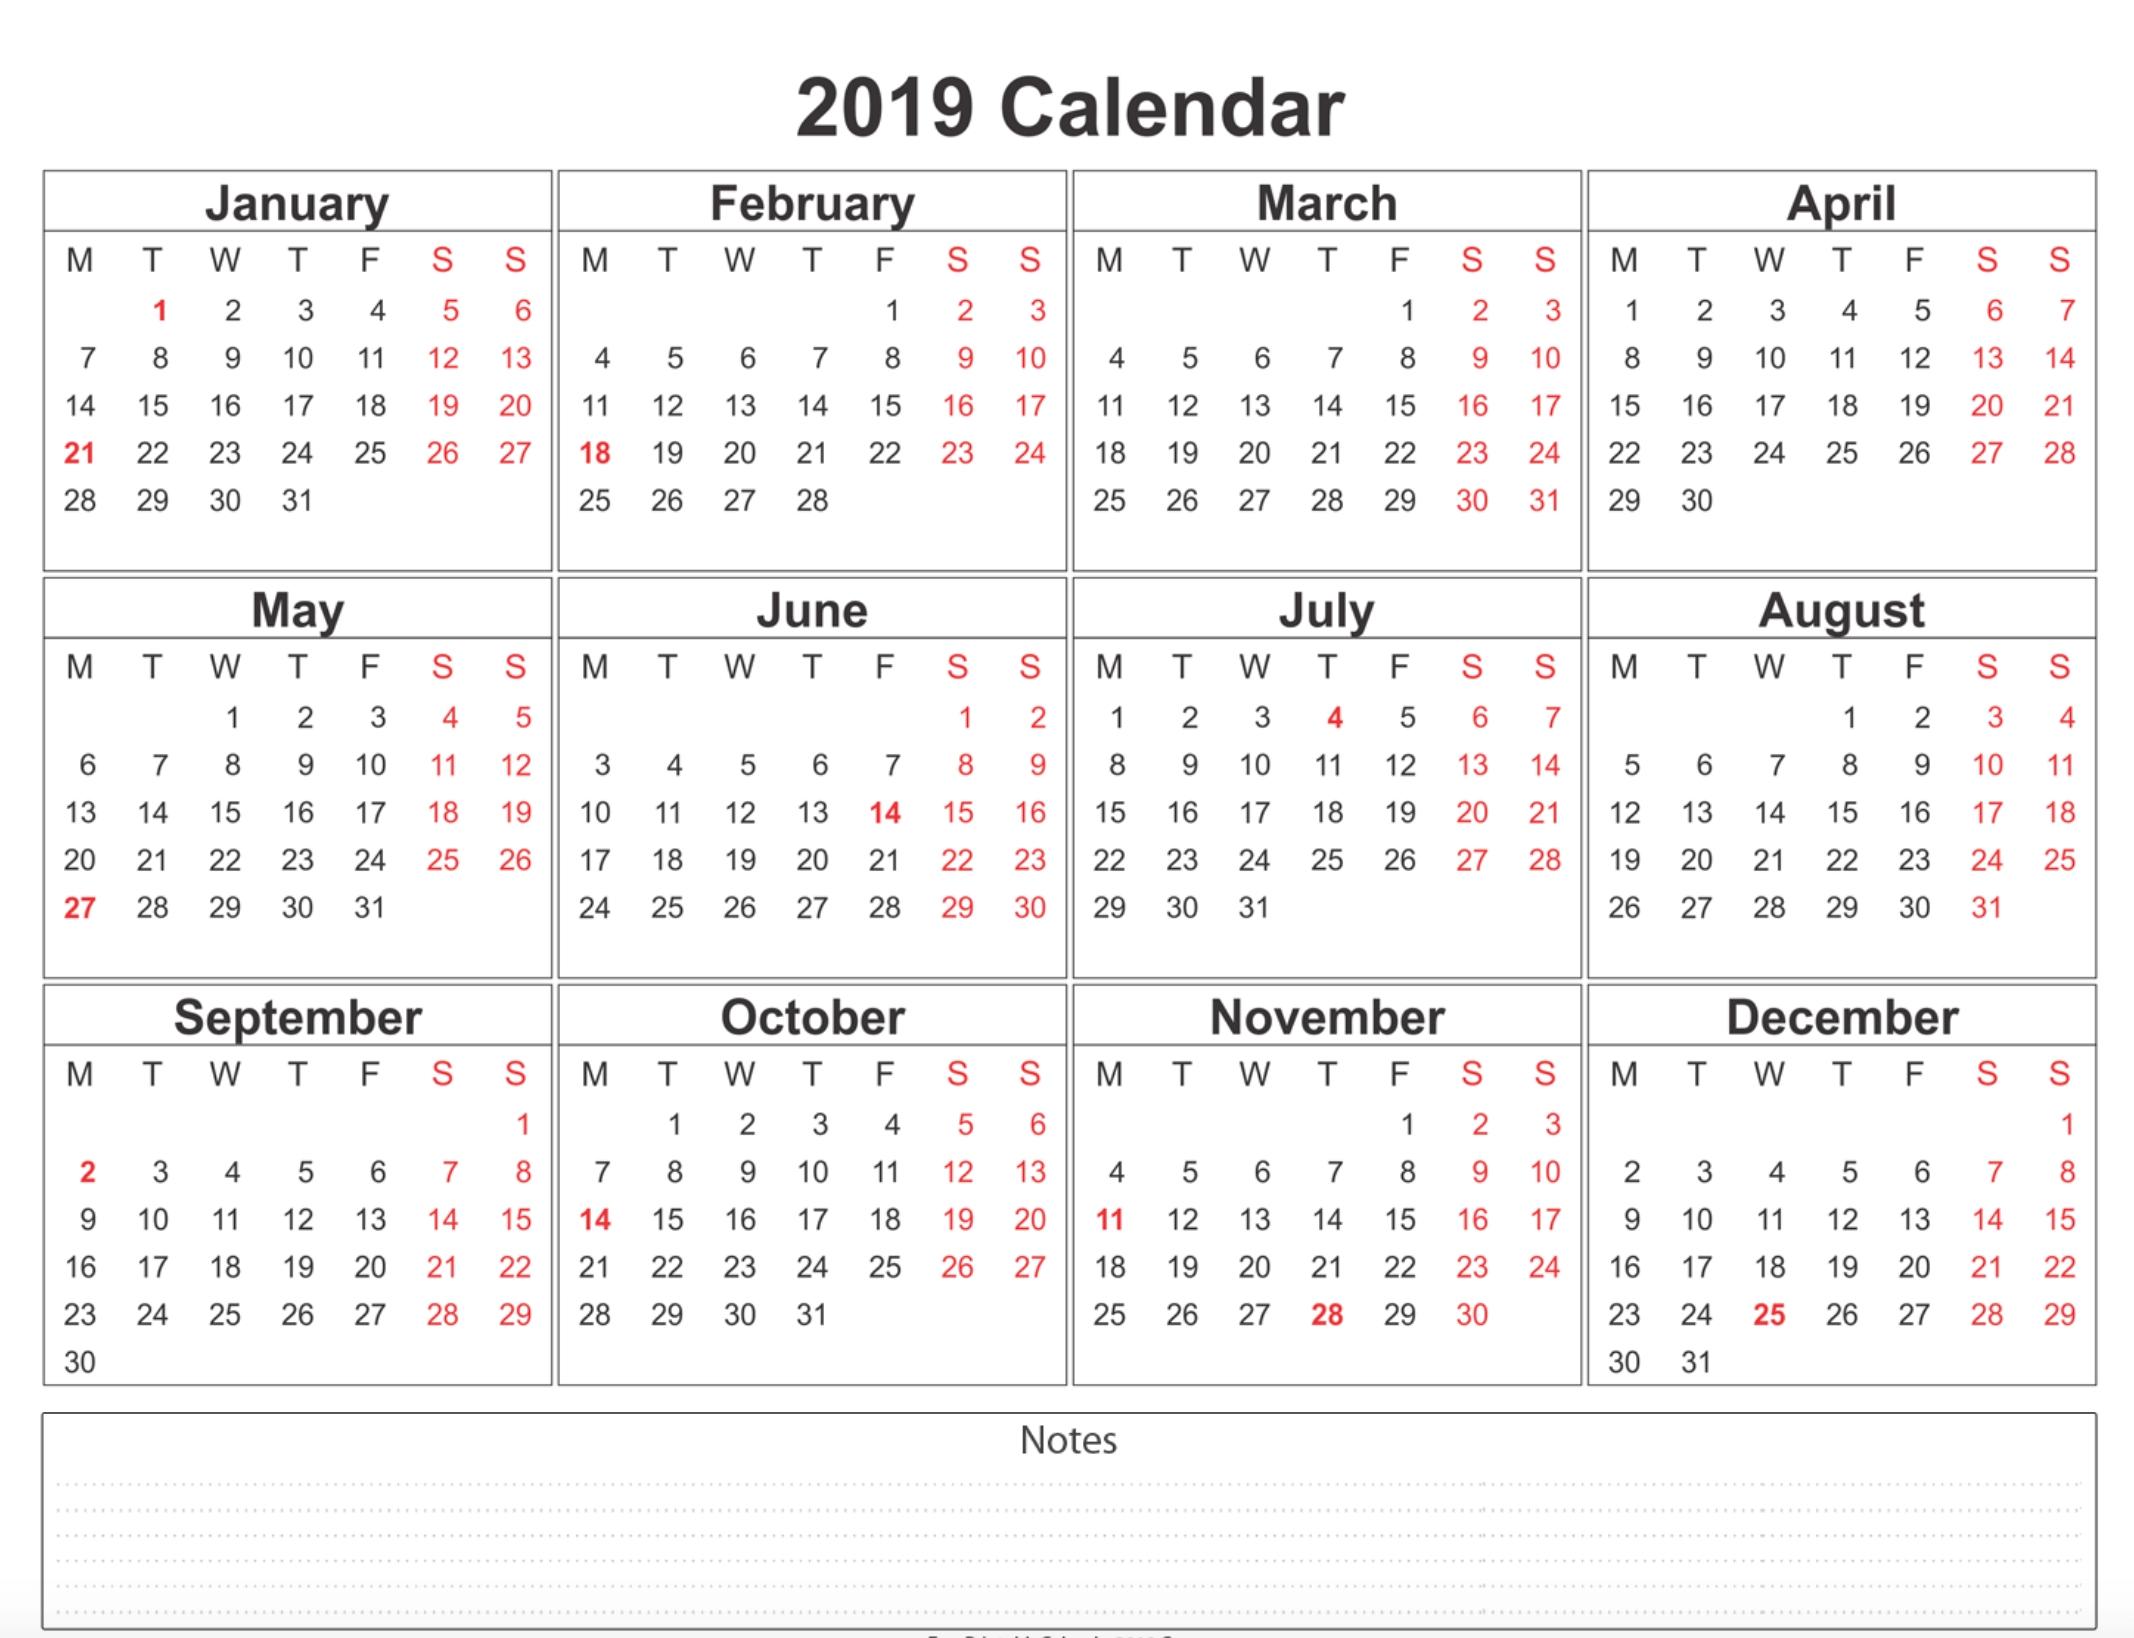 Free Printable Calendar 2019 With Holidays | Blank 12 Month Calendar Calendar 2019 Monthly Printable With Holidays